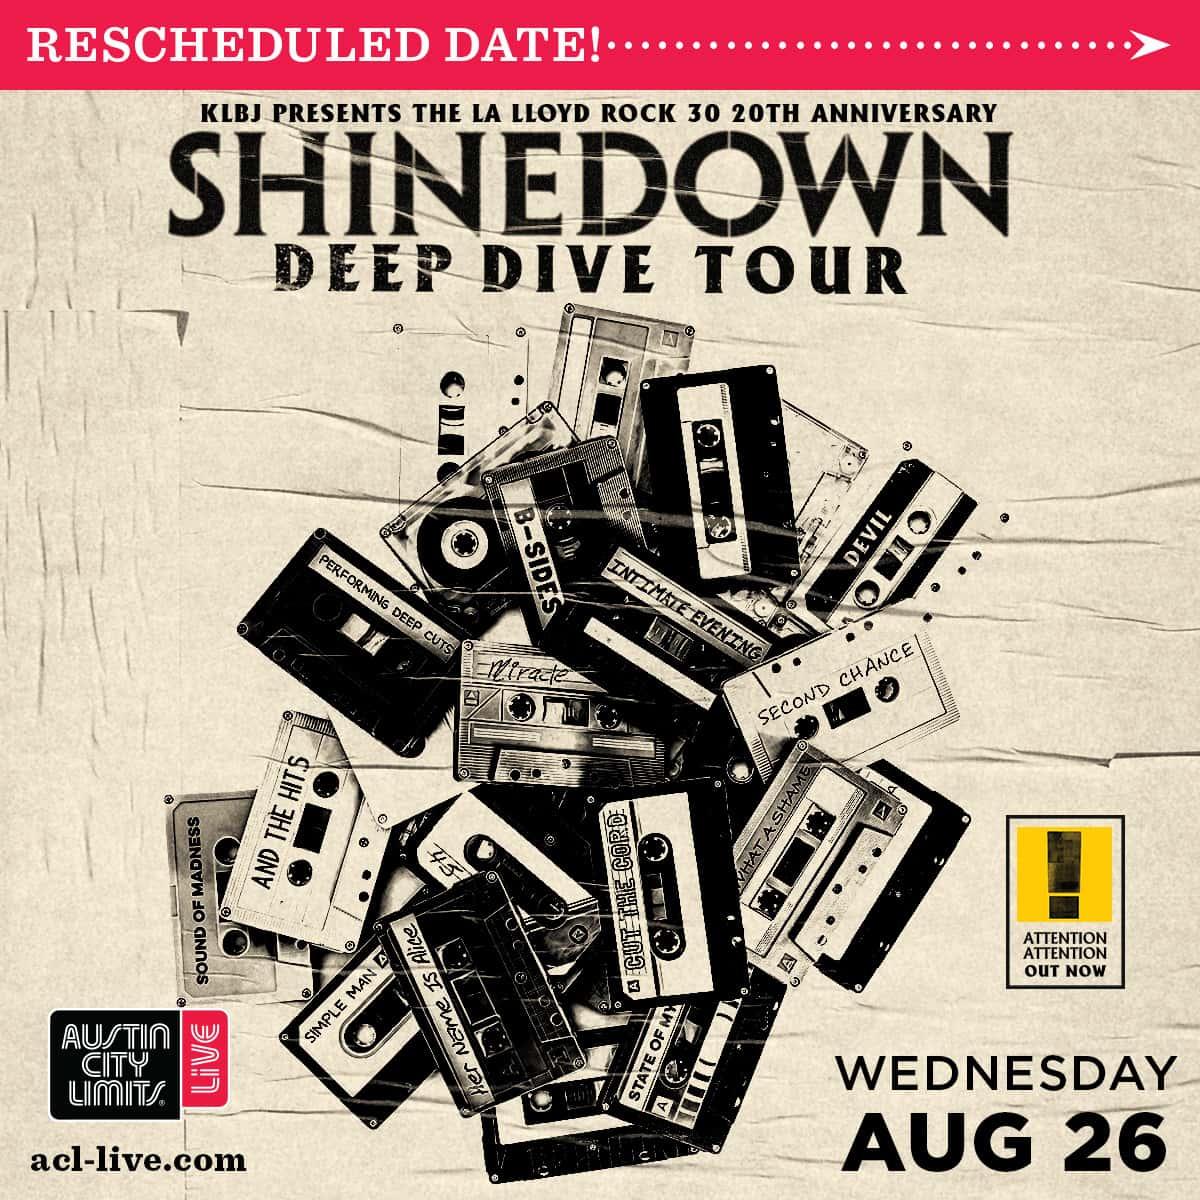 Shinedown new date